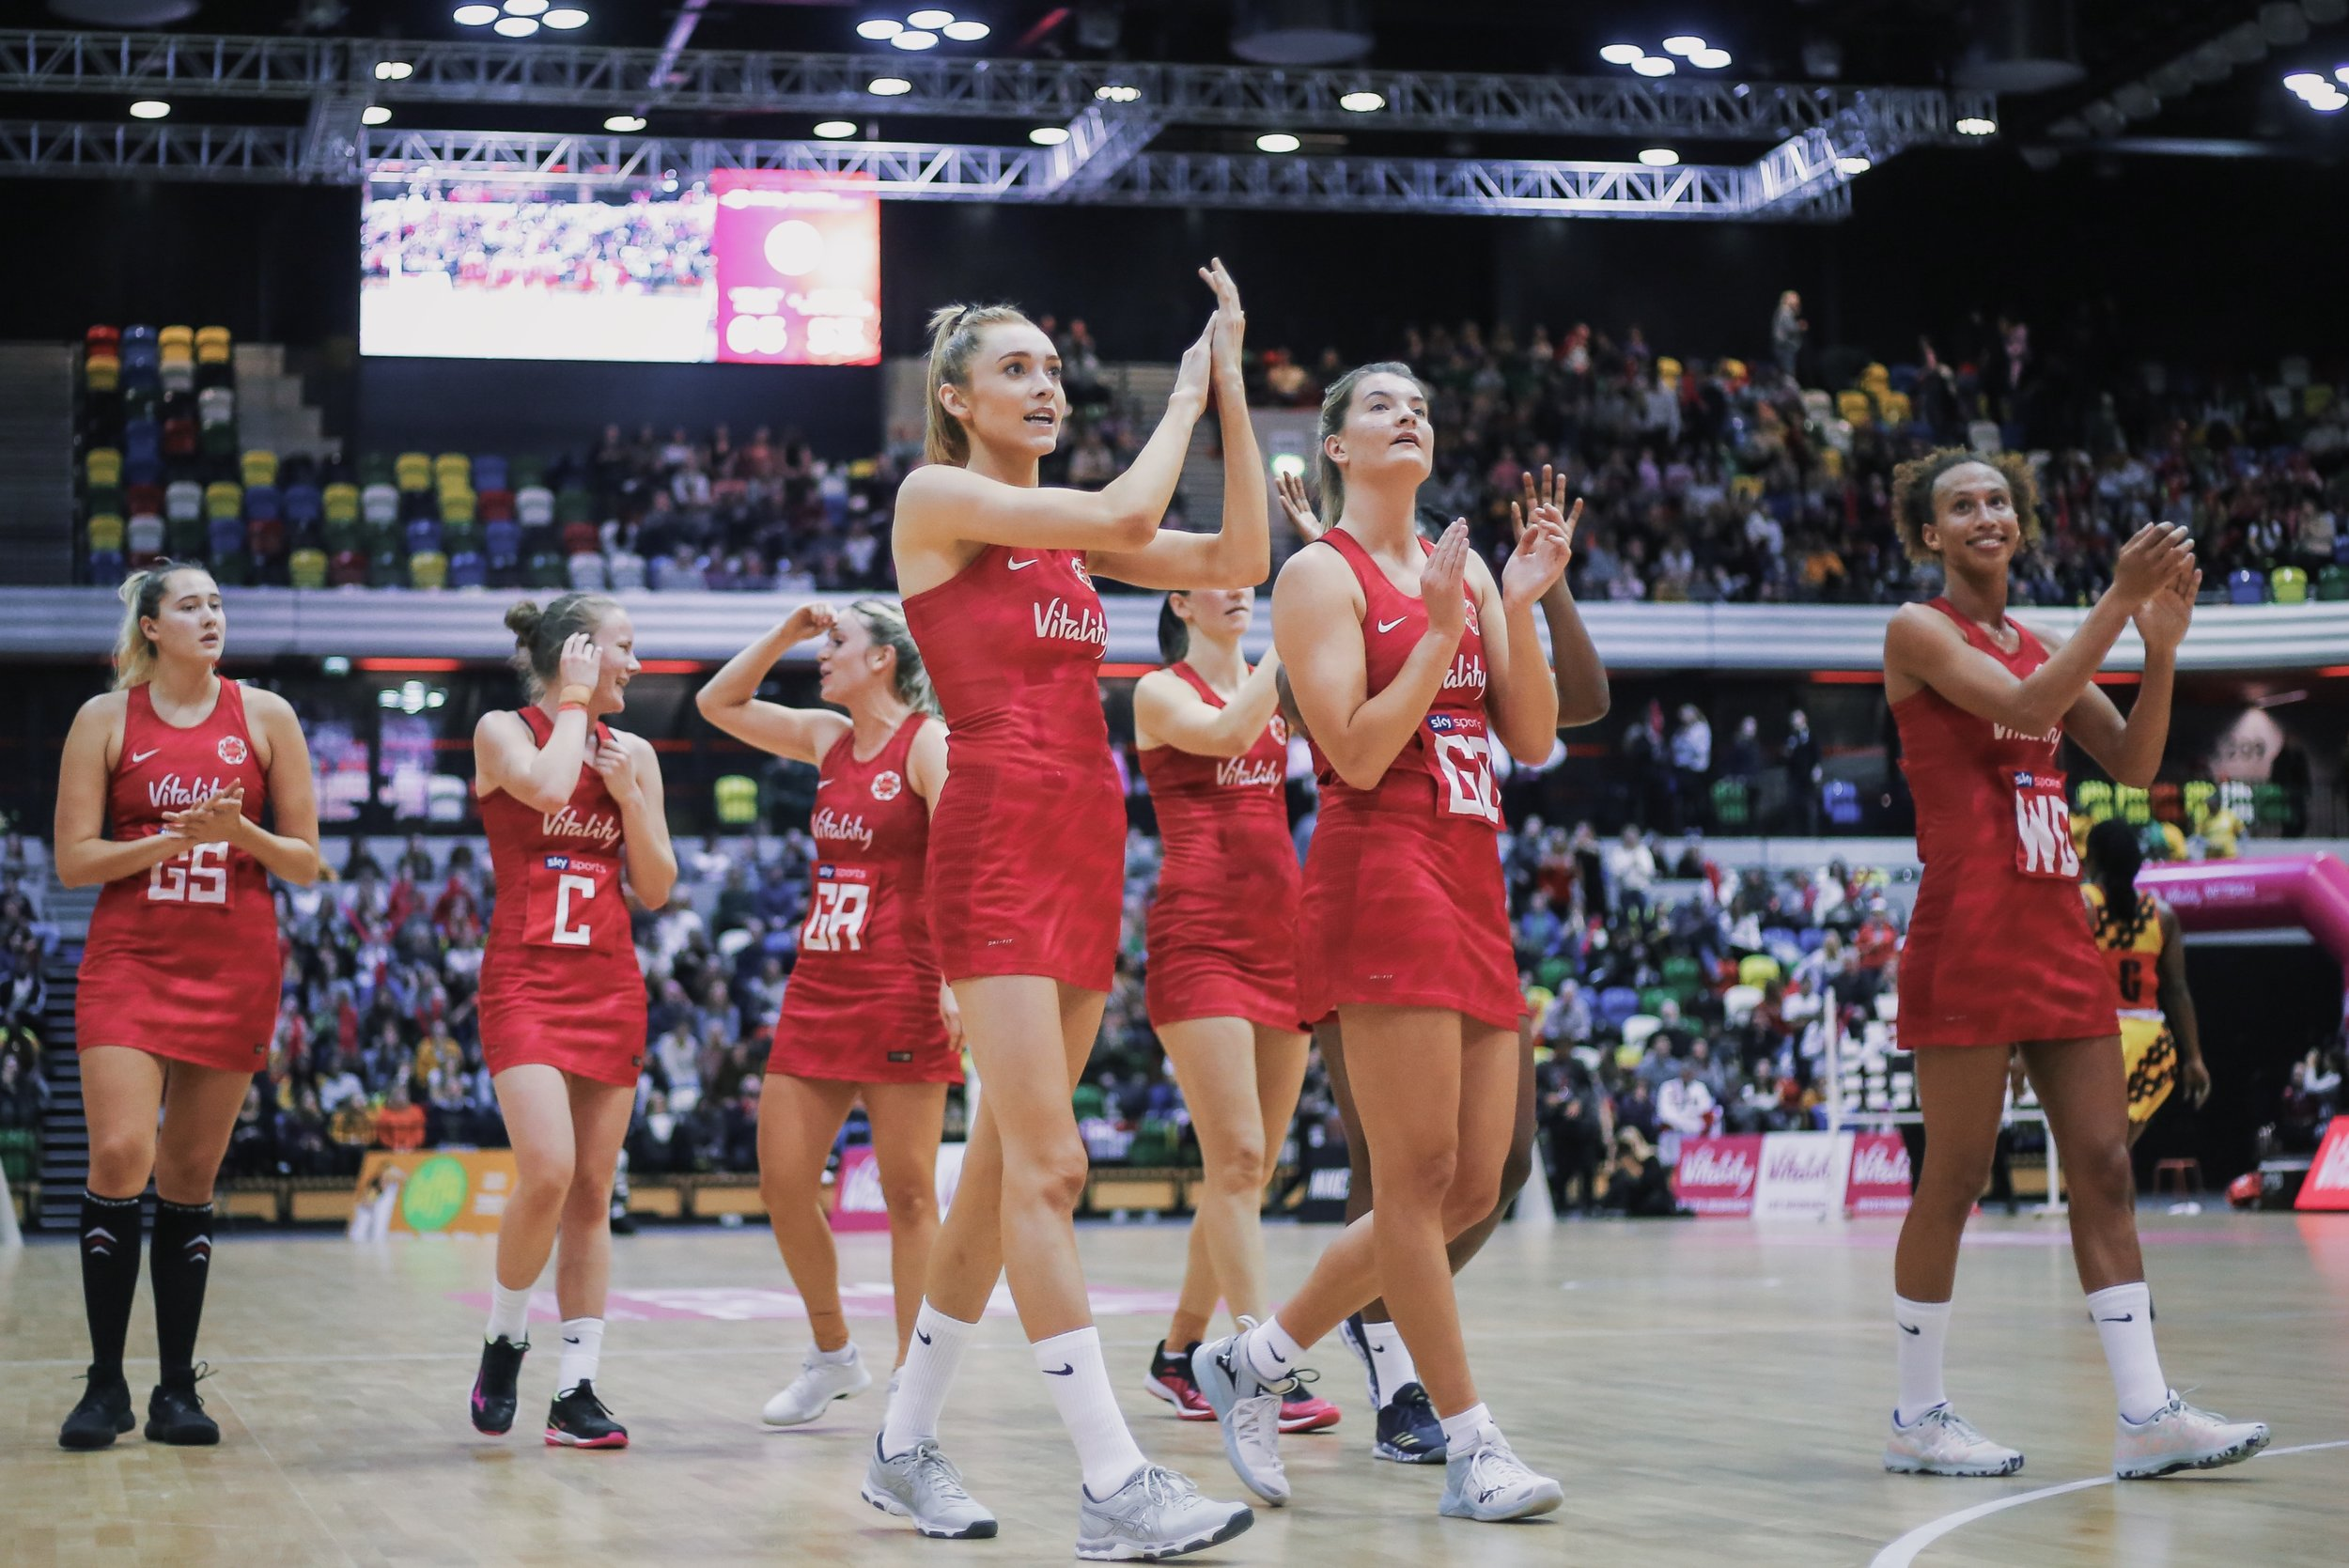 womens-netball-sport-england-uganda-international-series-25.jpg